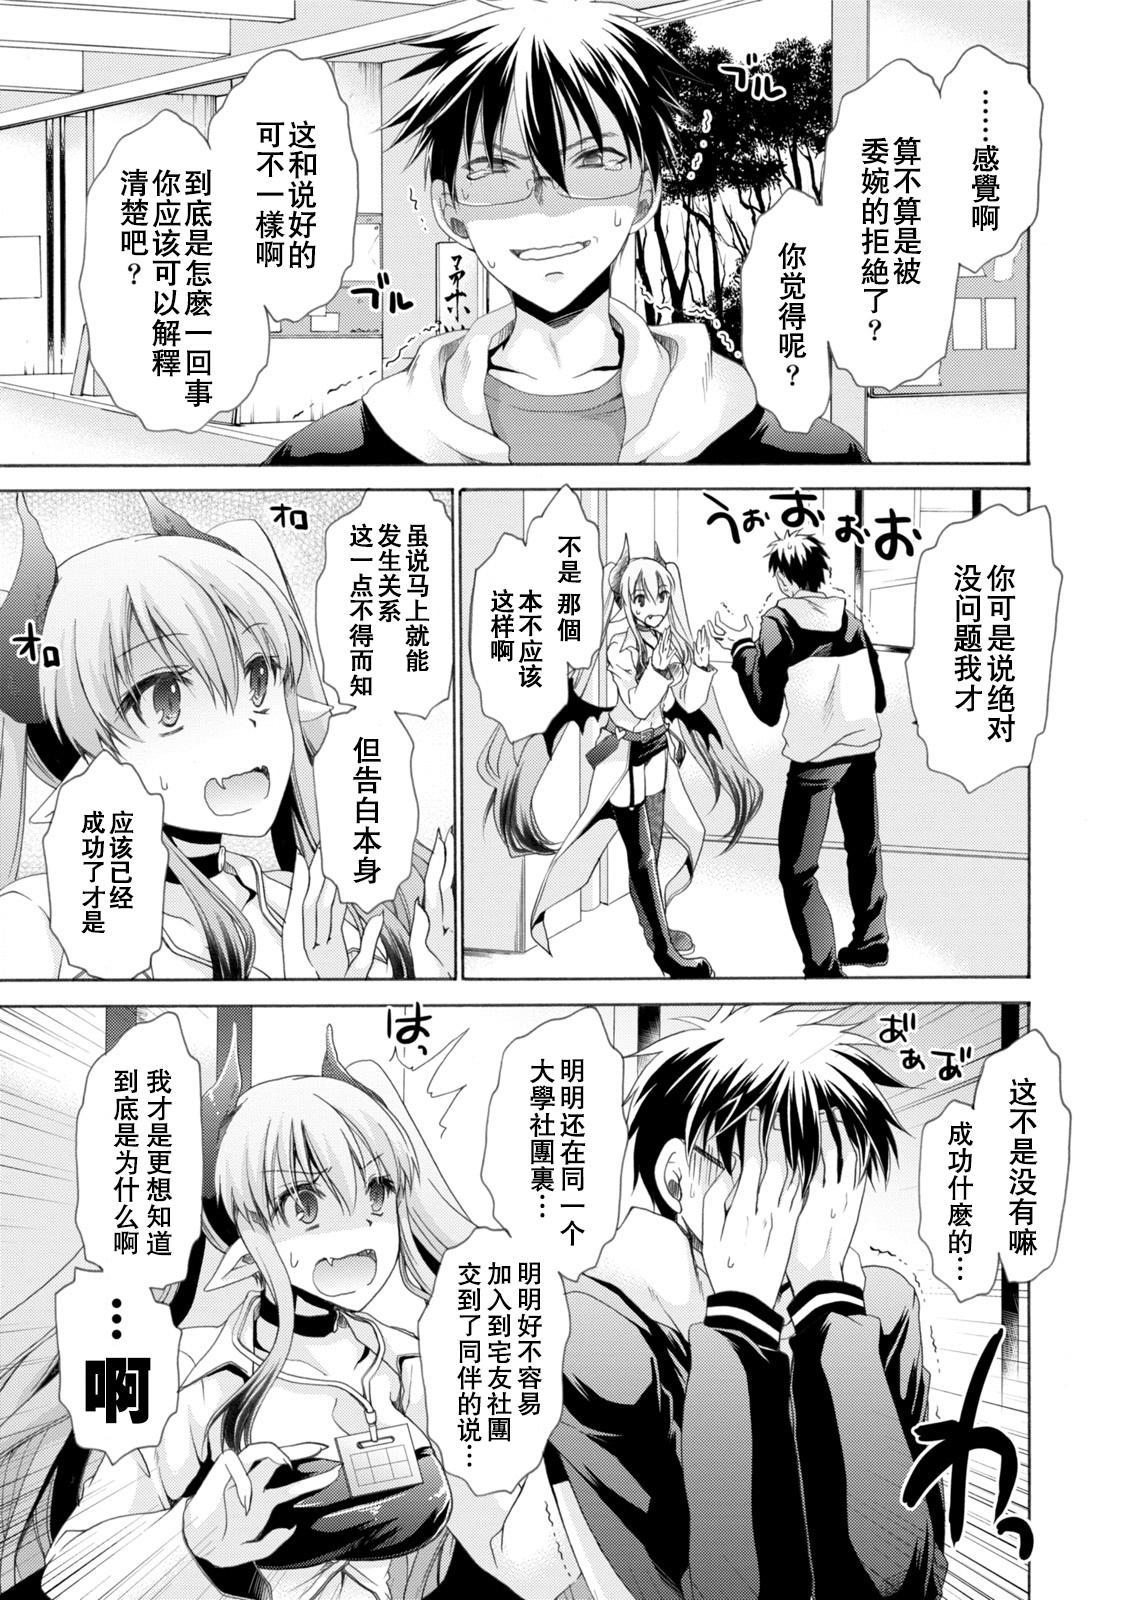 [Shinonome Ryu] Ore to Kanojo to Owaru Sekai - World's end LoveStory 1-5 [Chinese] [爱弹幕汉化组] [Digital] 28